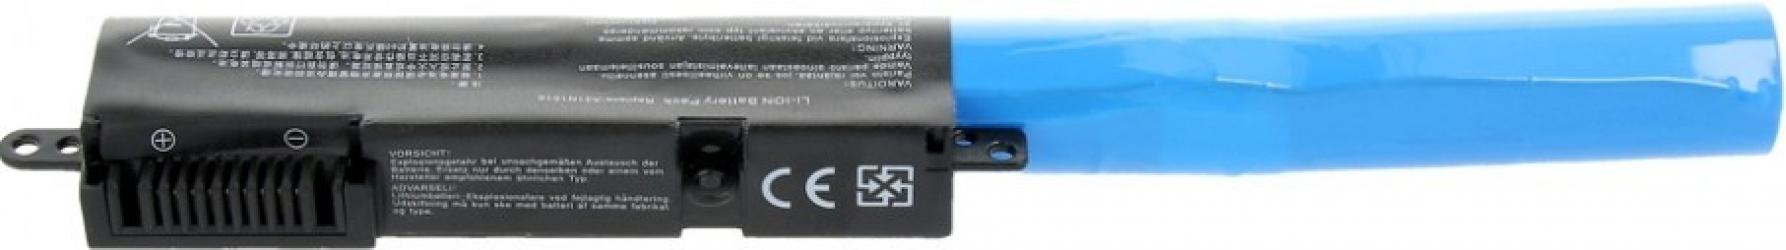 Baterie Laptop Eco Box Asus A540 F540 X540 A31N1519